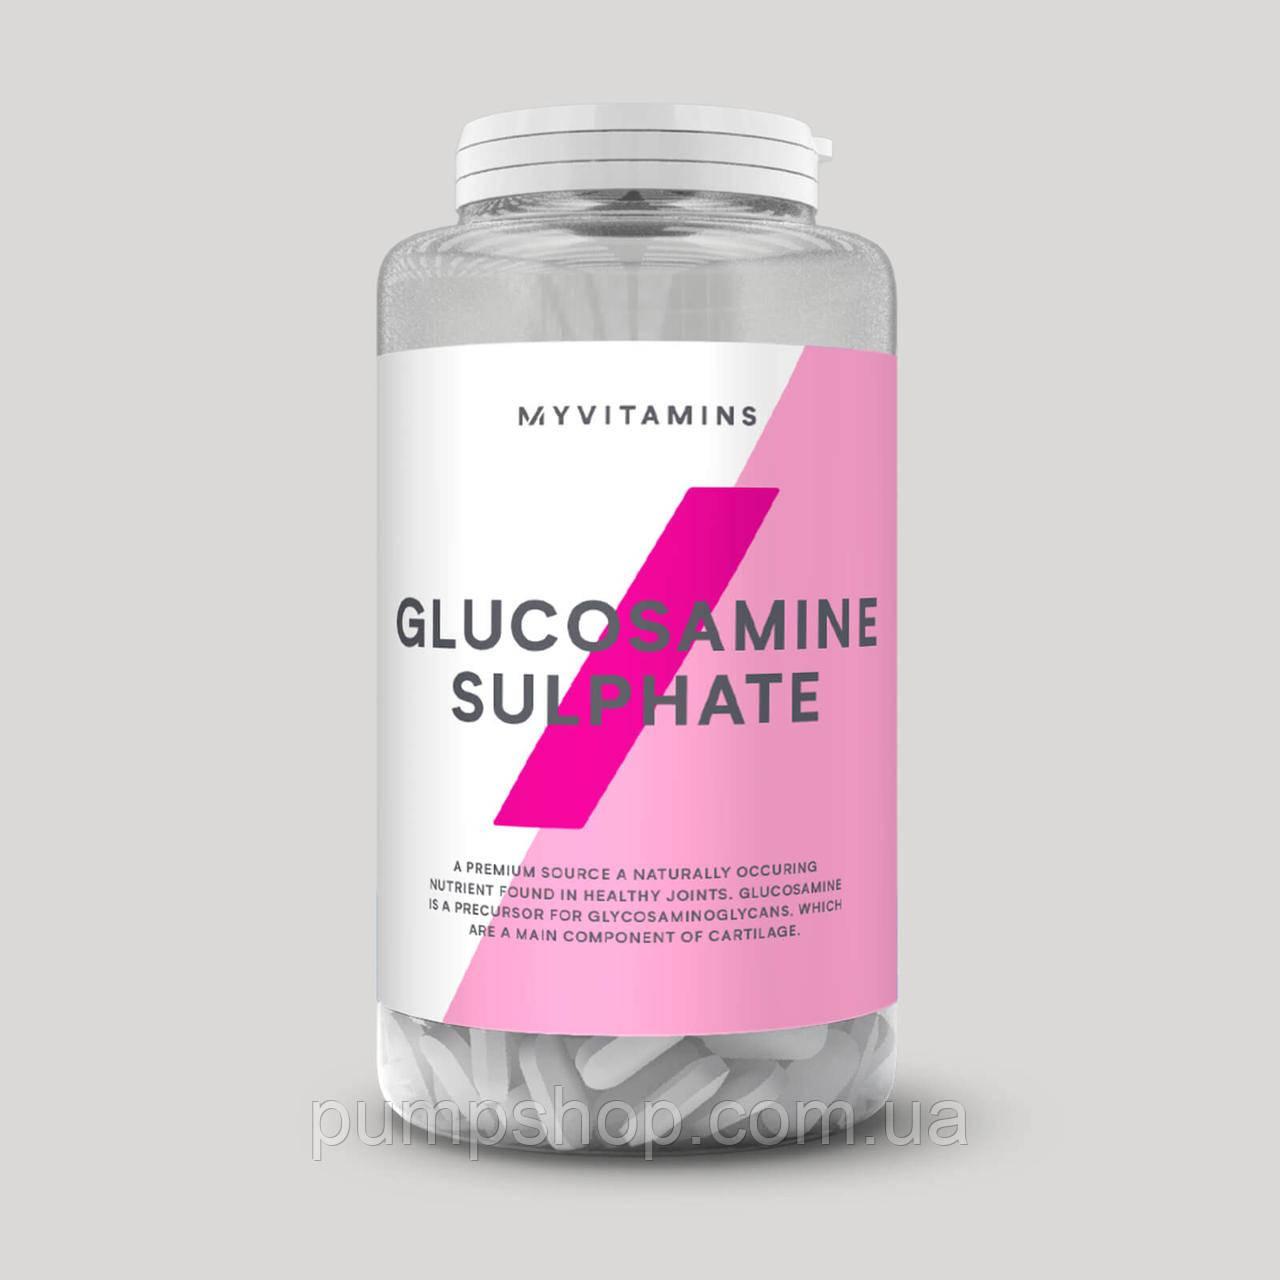 Глюкозамін-сульфат Myprotein Glucosamine sulphate 120 капс.